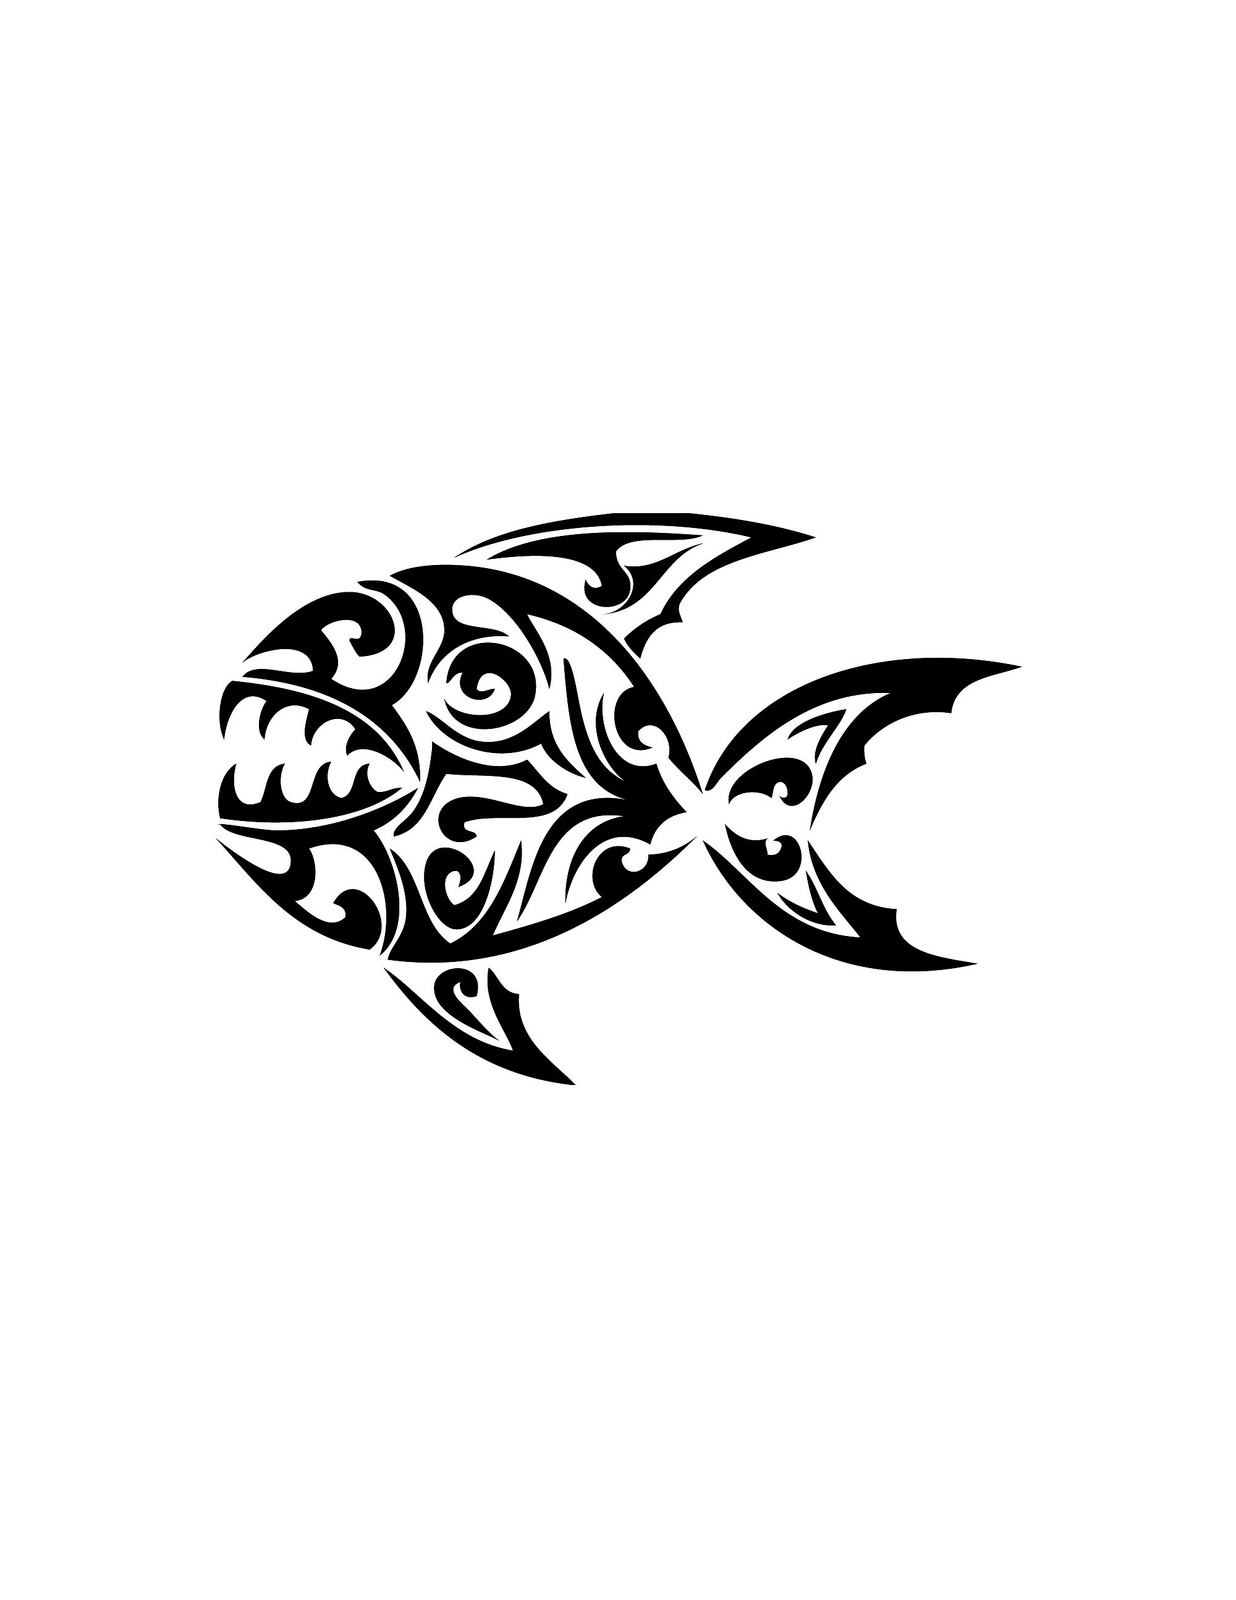 Piranha Tattoo Designs